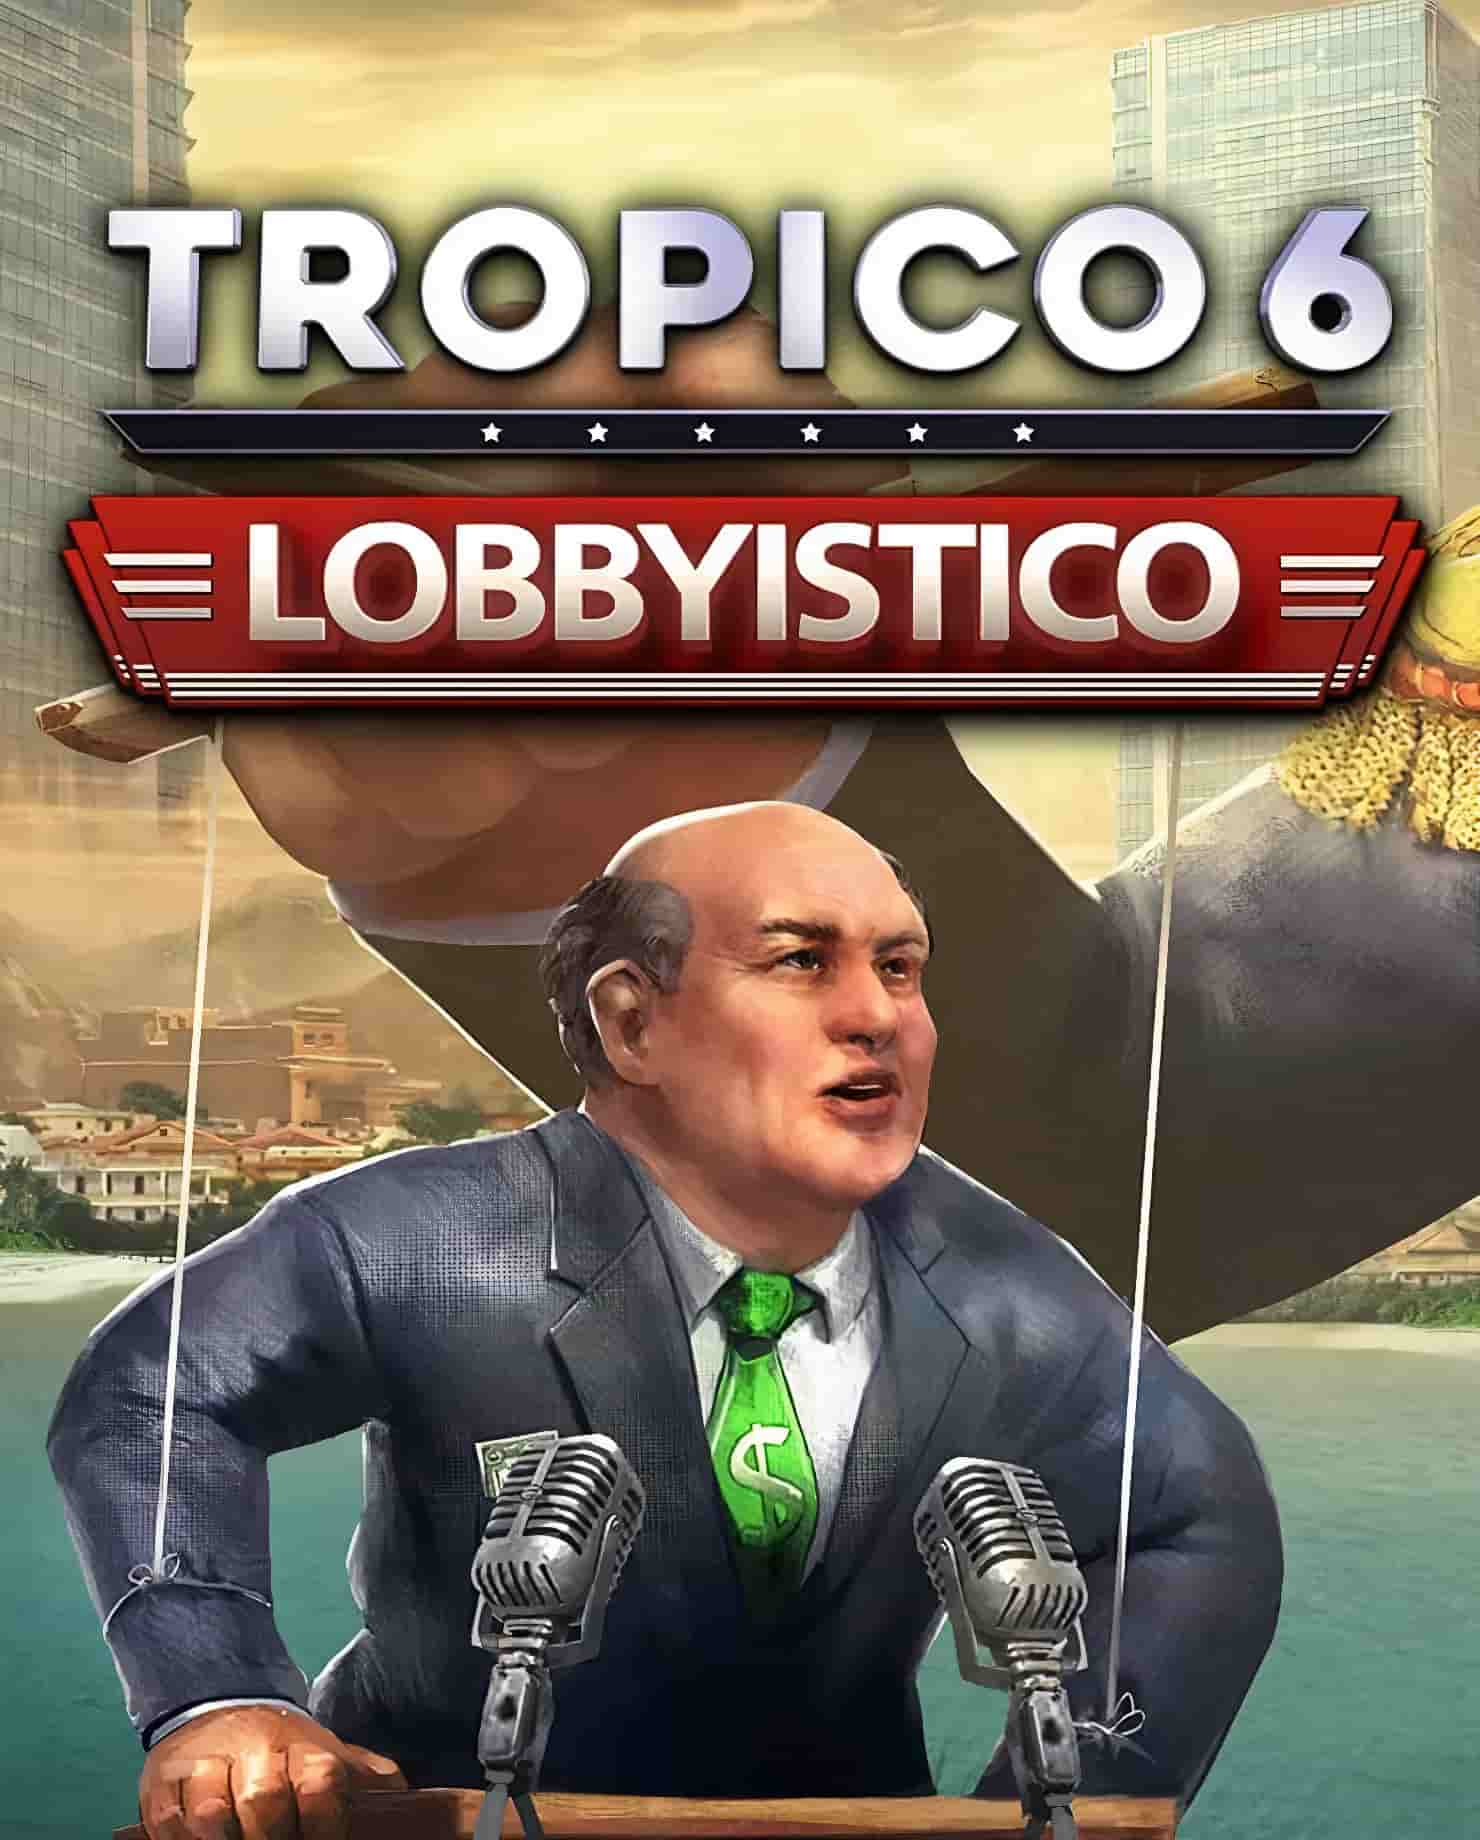 Tropico 6 – Lobbyistico